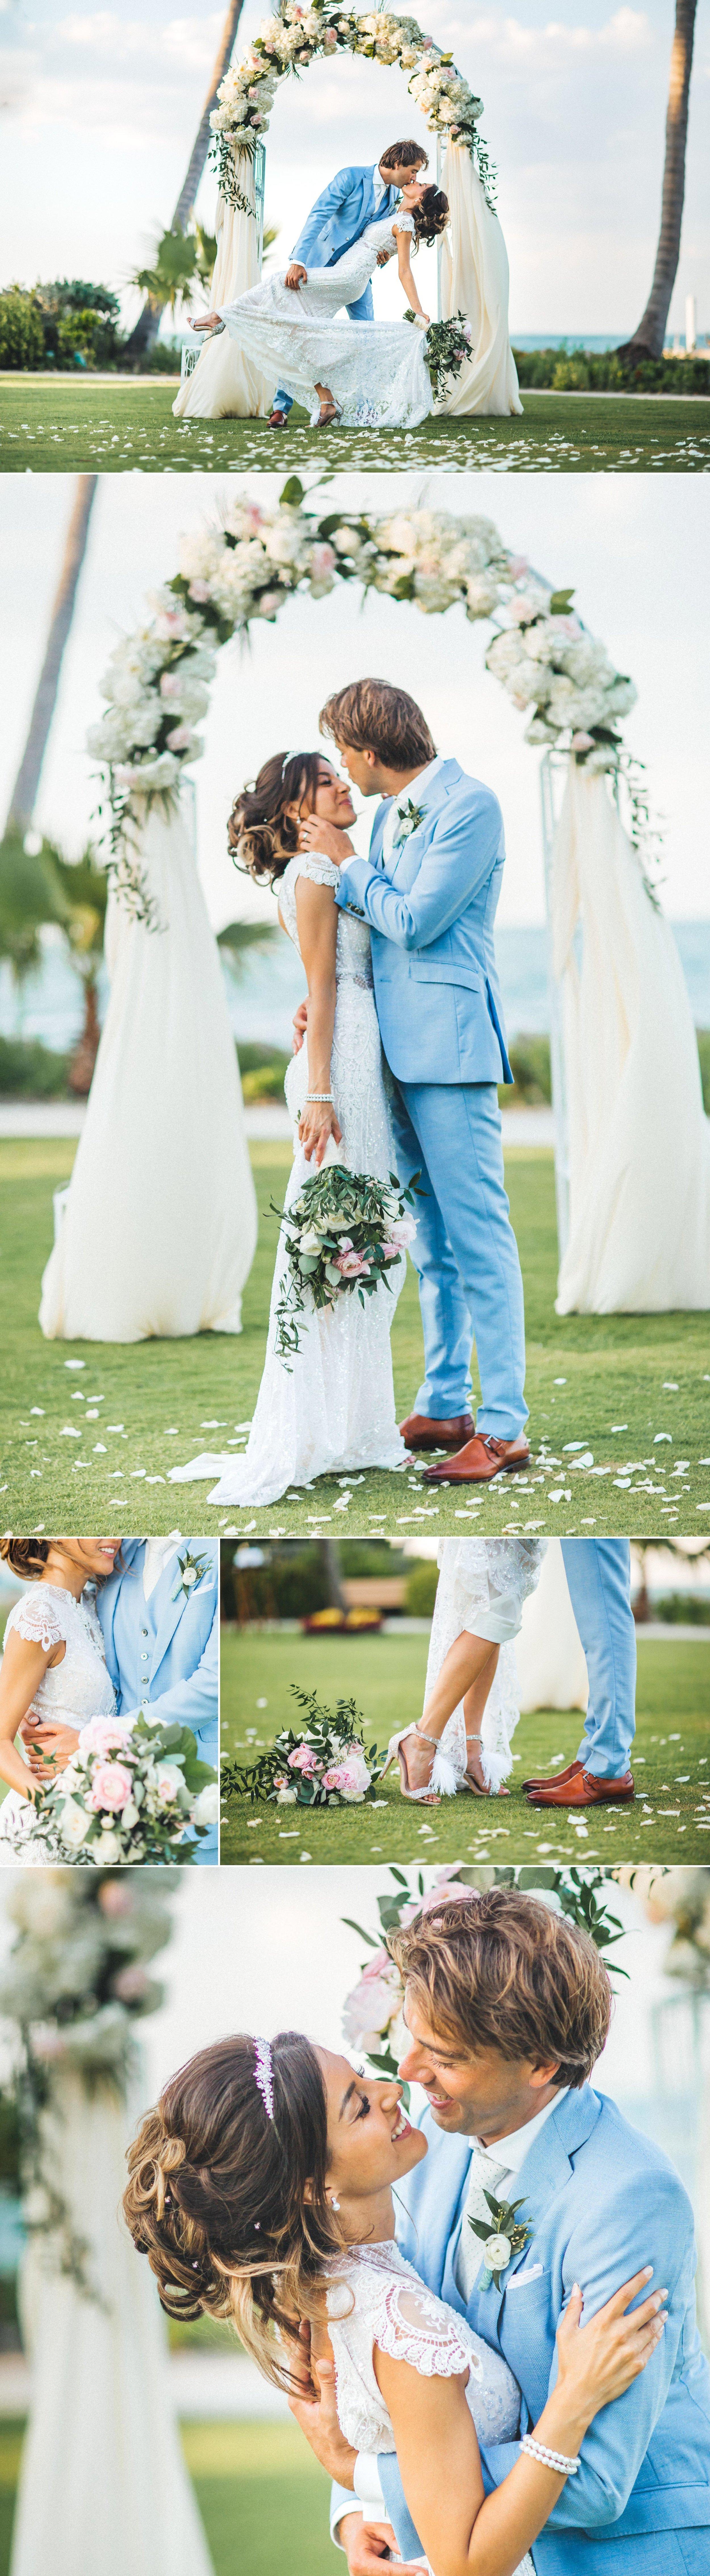 Captiva Island Destination Elopement Wedding Photography-blog- Zohra+David-by-Shaina-DeCiryan21.jpg